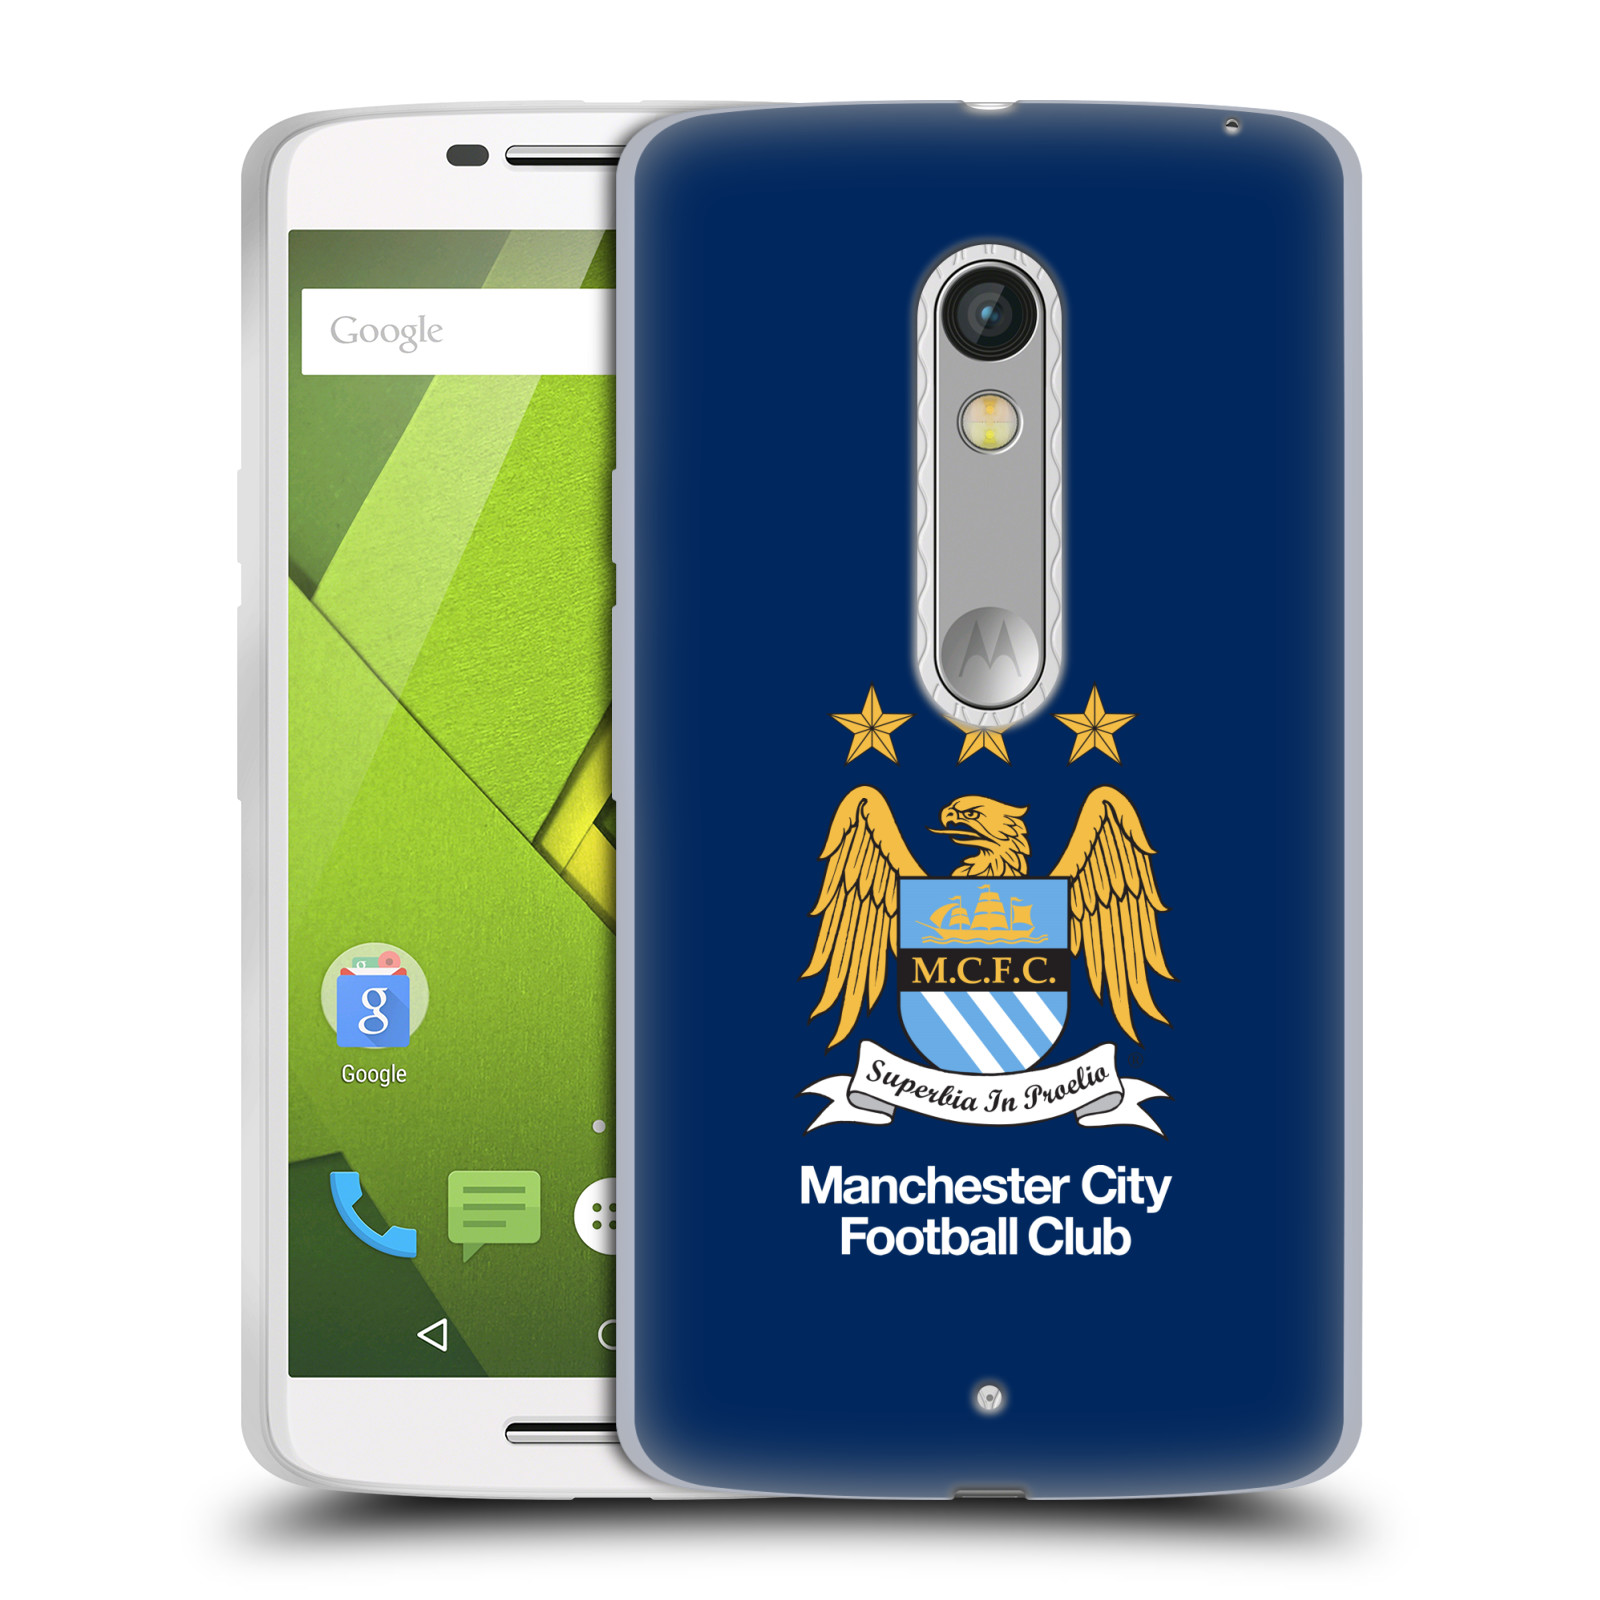 HEAD CASE silikonový obal na mobil Lenovo Moto X PLAY Fotbalový klub Manchester City modré pozadí velký znak